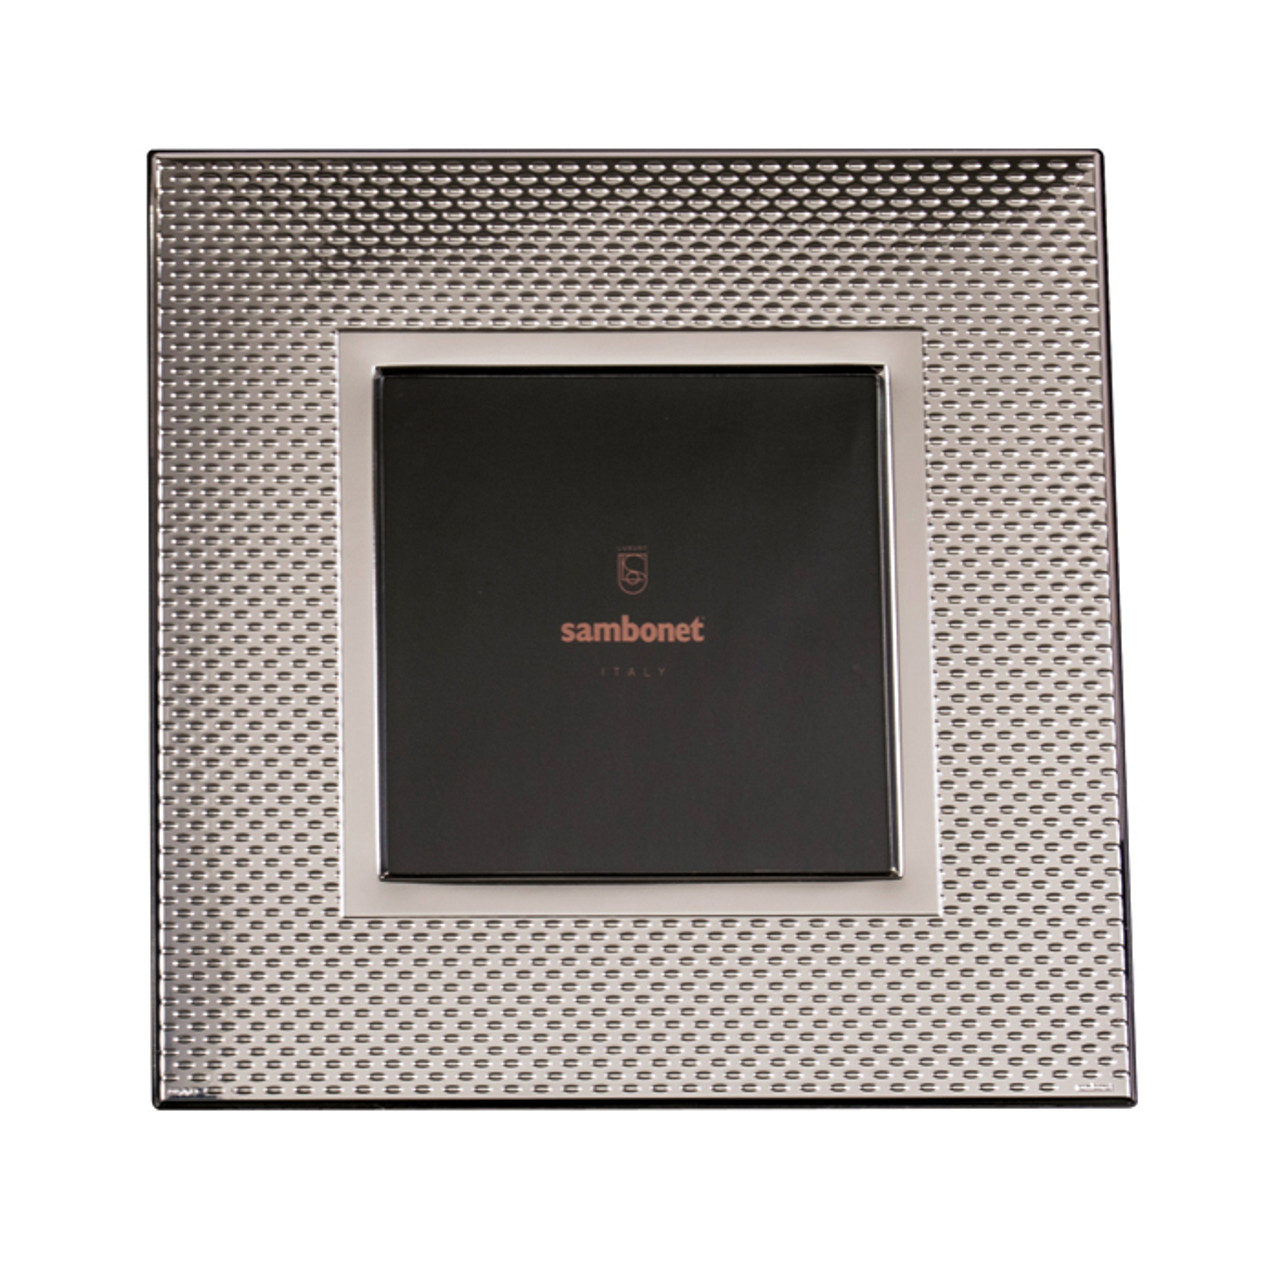 Frames Dew Frame 7 X 7 Inch Sambonet Online Store